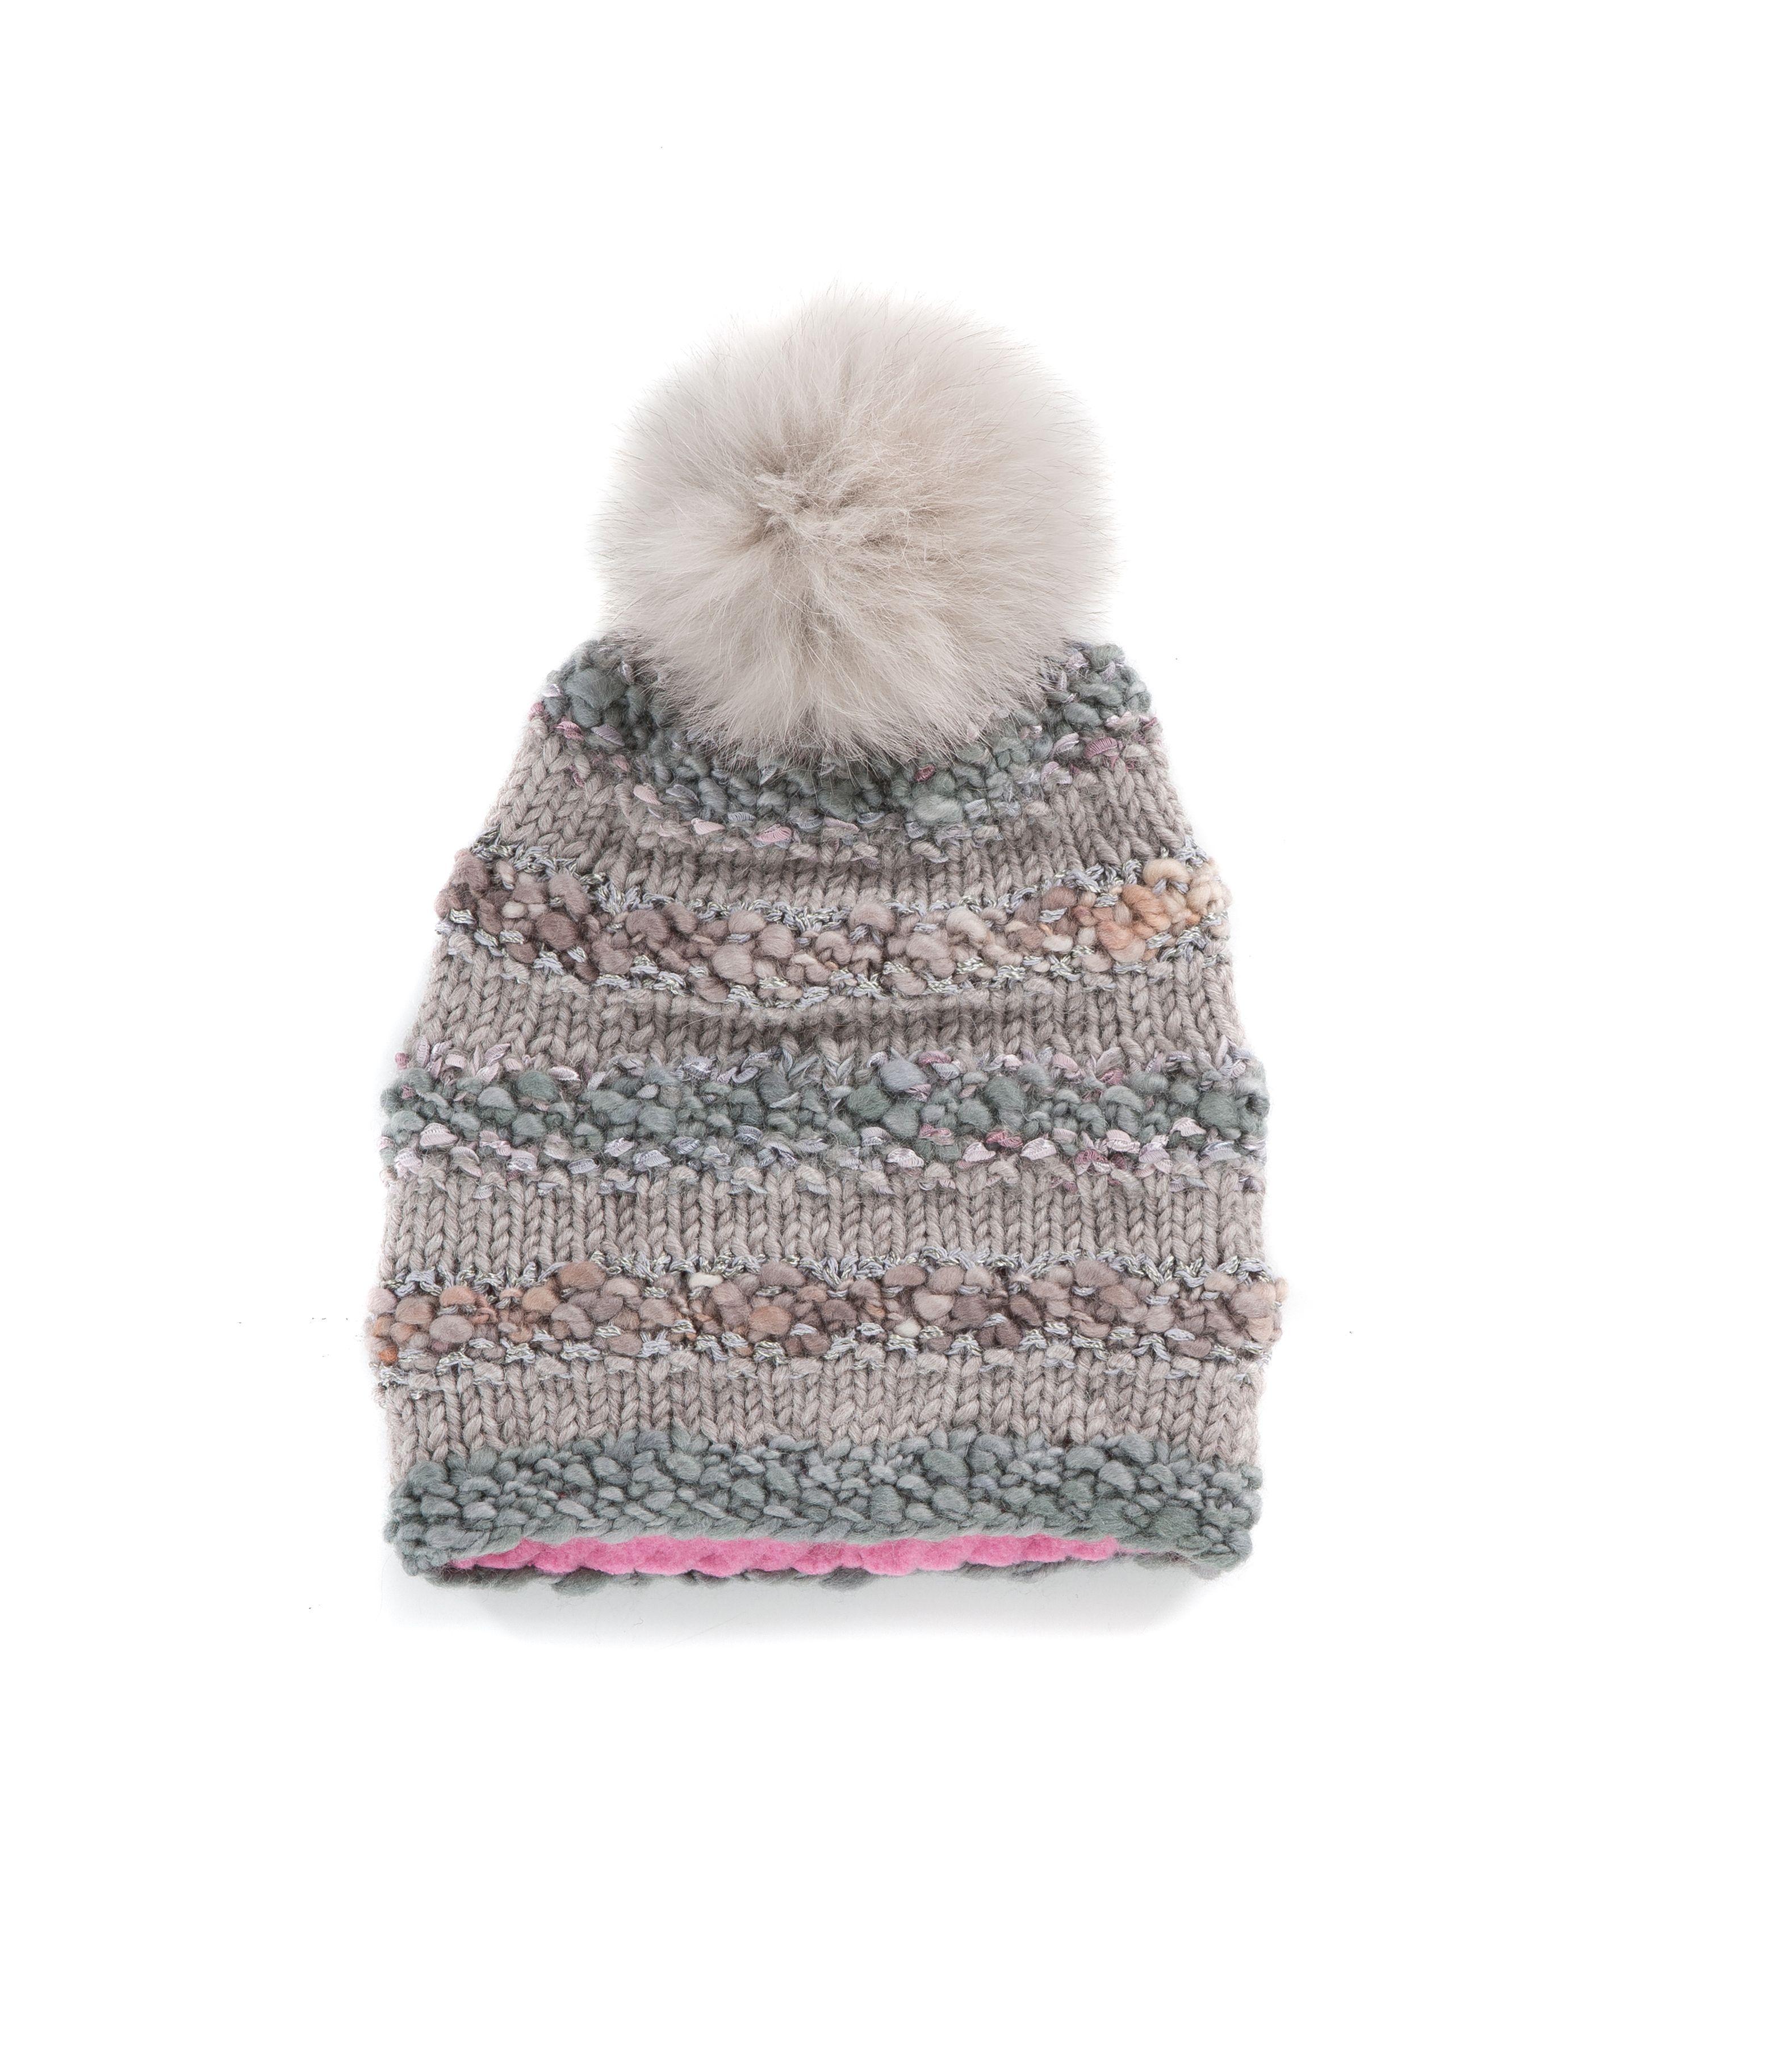 e52083ad346df KNIT BEANIE CAP FOR WOMEN in Grey River Rock - The GŌBLE Women Knit Beanie  Cap